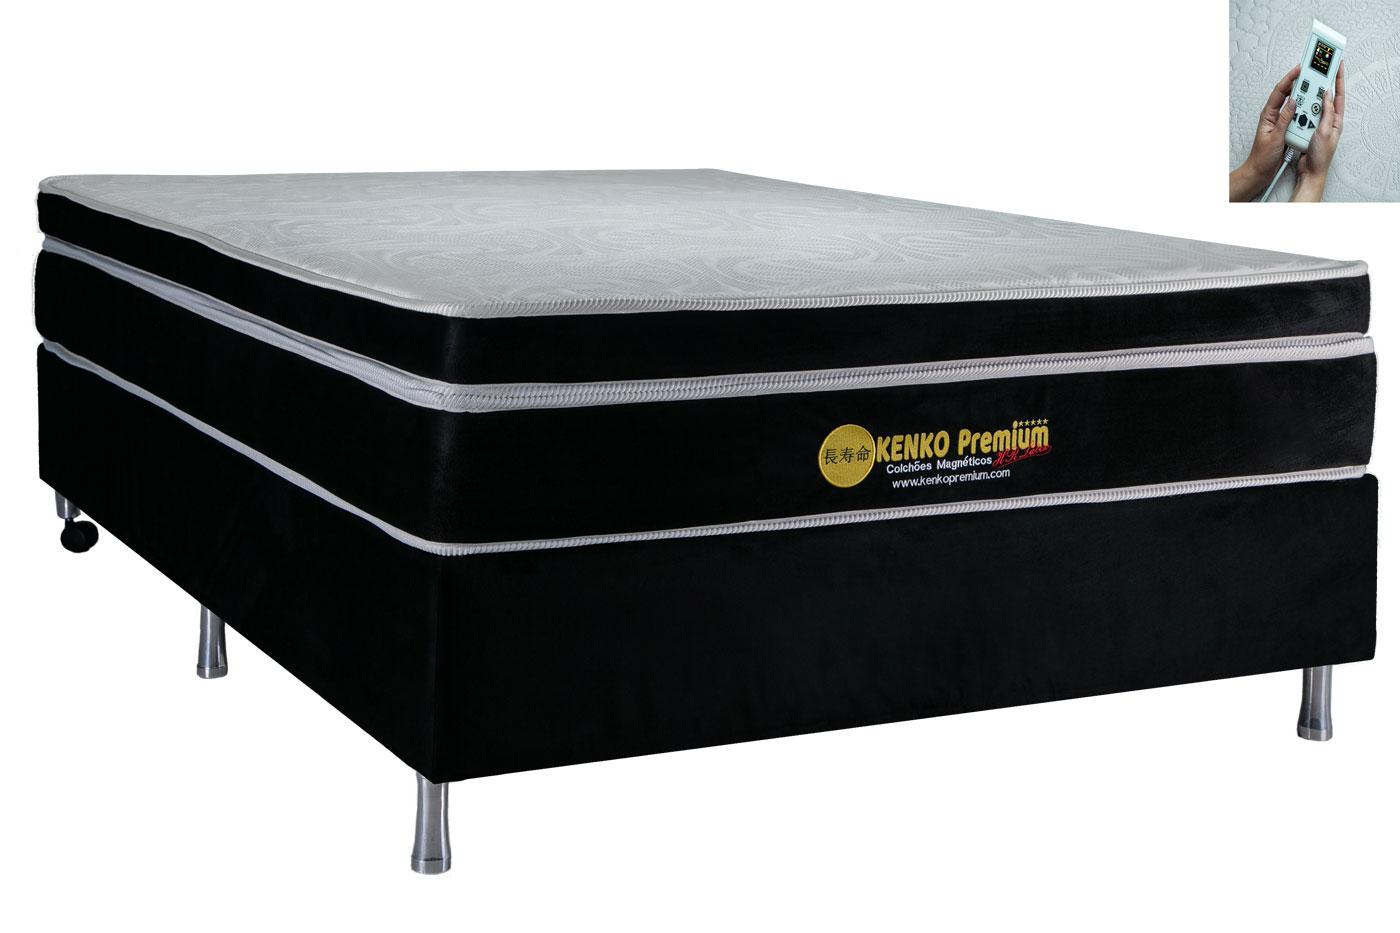 Colchão Magnético Kenko Premium, HR 29cm Látex + Massagem + Cromo - Queen Size 1,58X1,98  - Kenko Premium Colchões